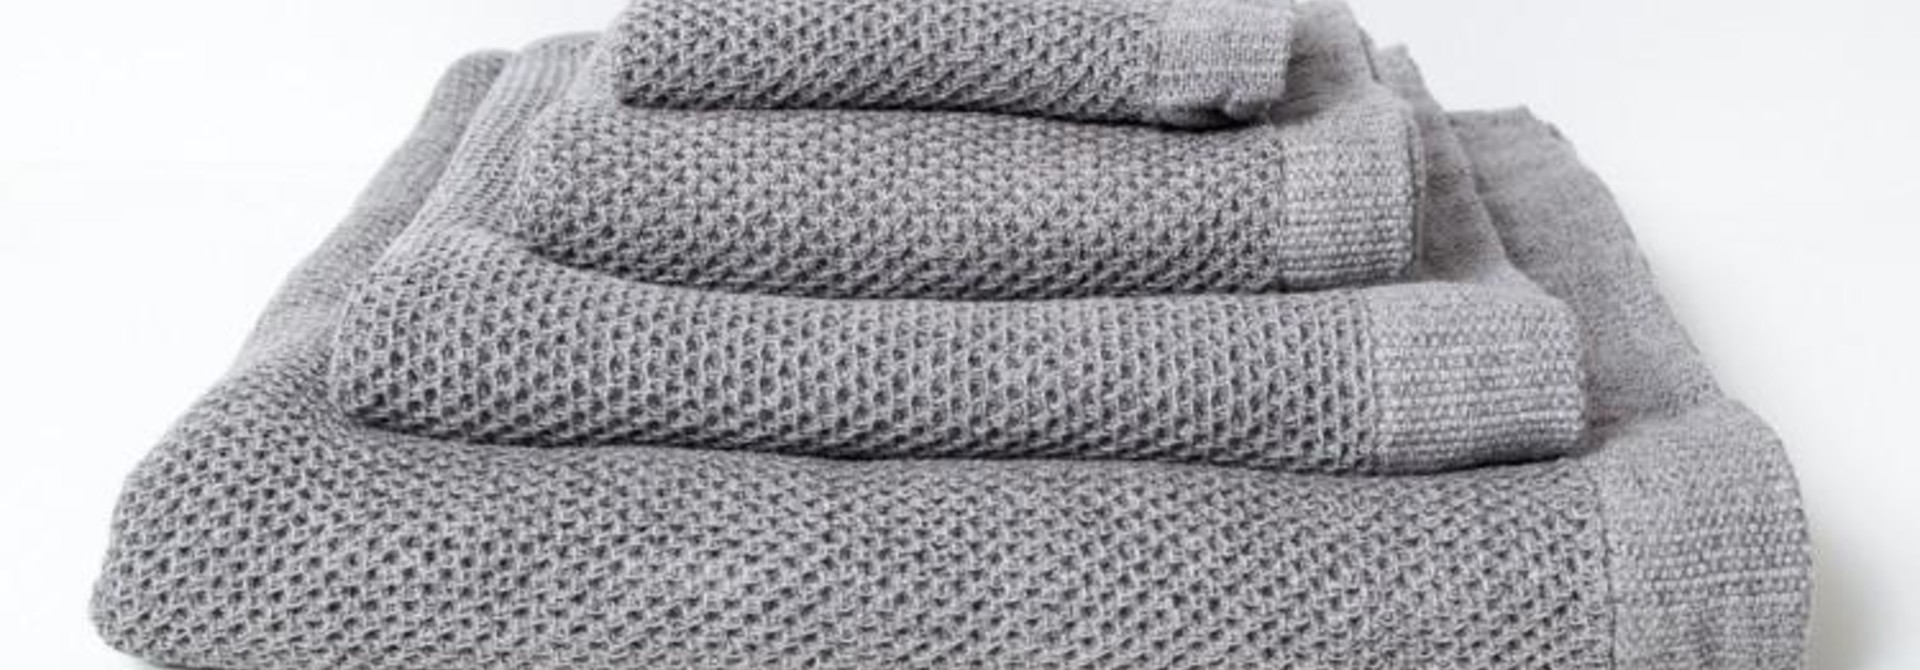 Lattice Bath Towel - Ice Grey